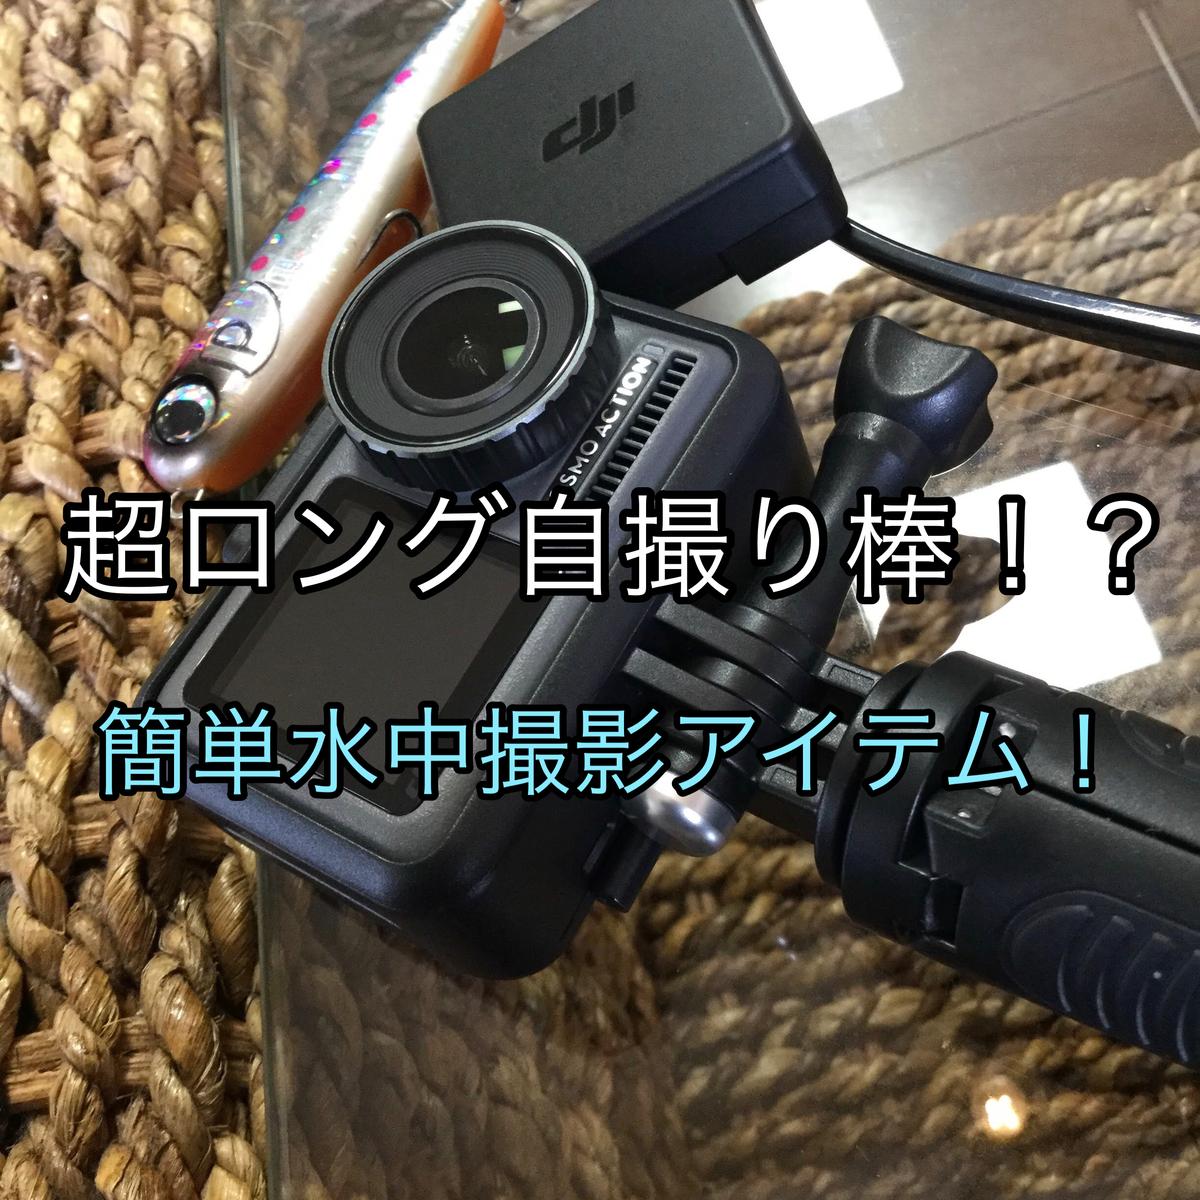 f:id:shoregomoku:20210530121035j:plain